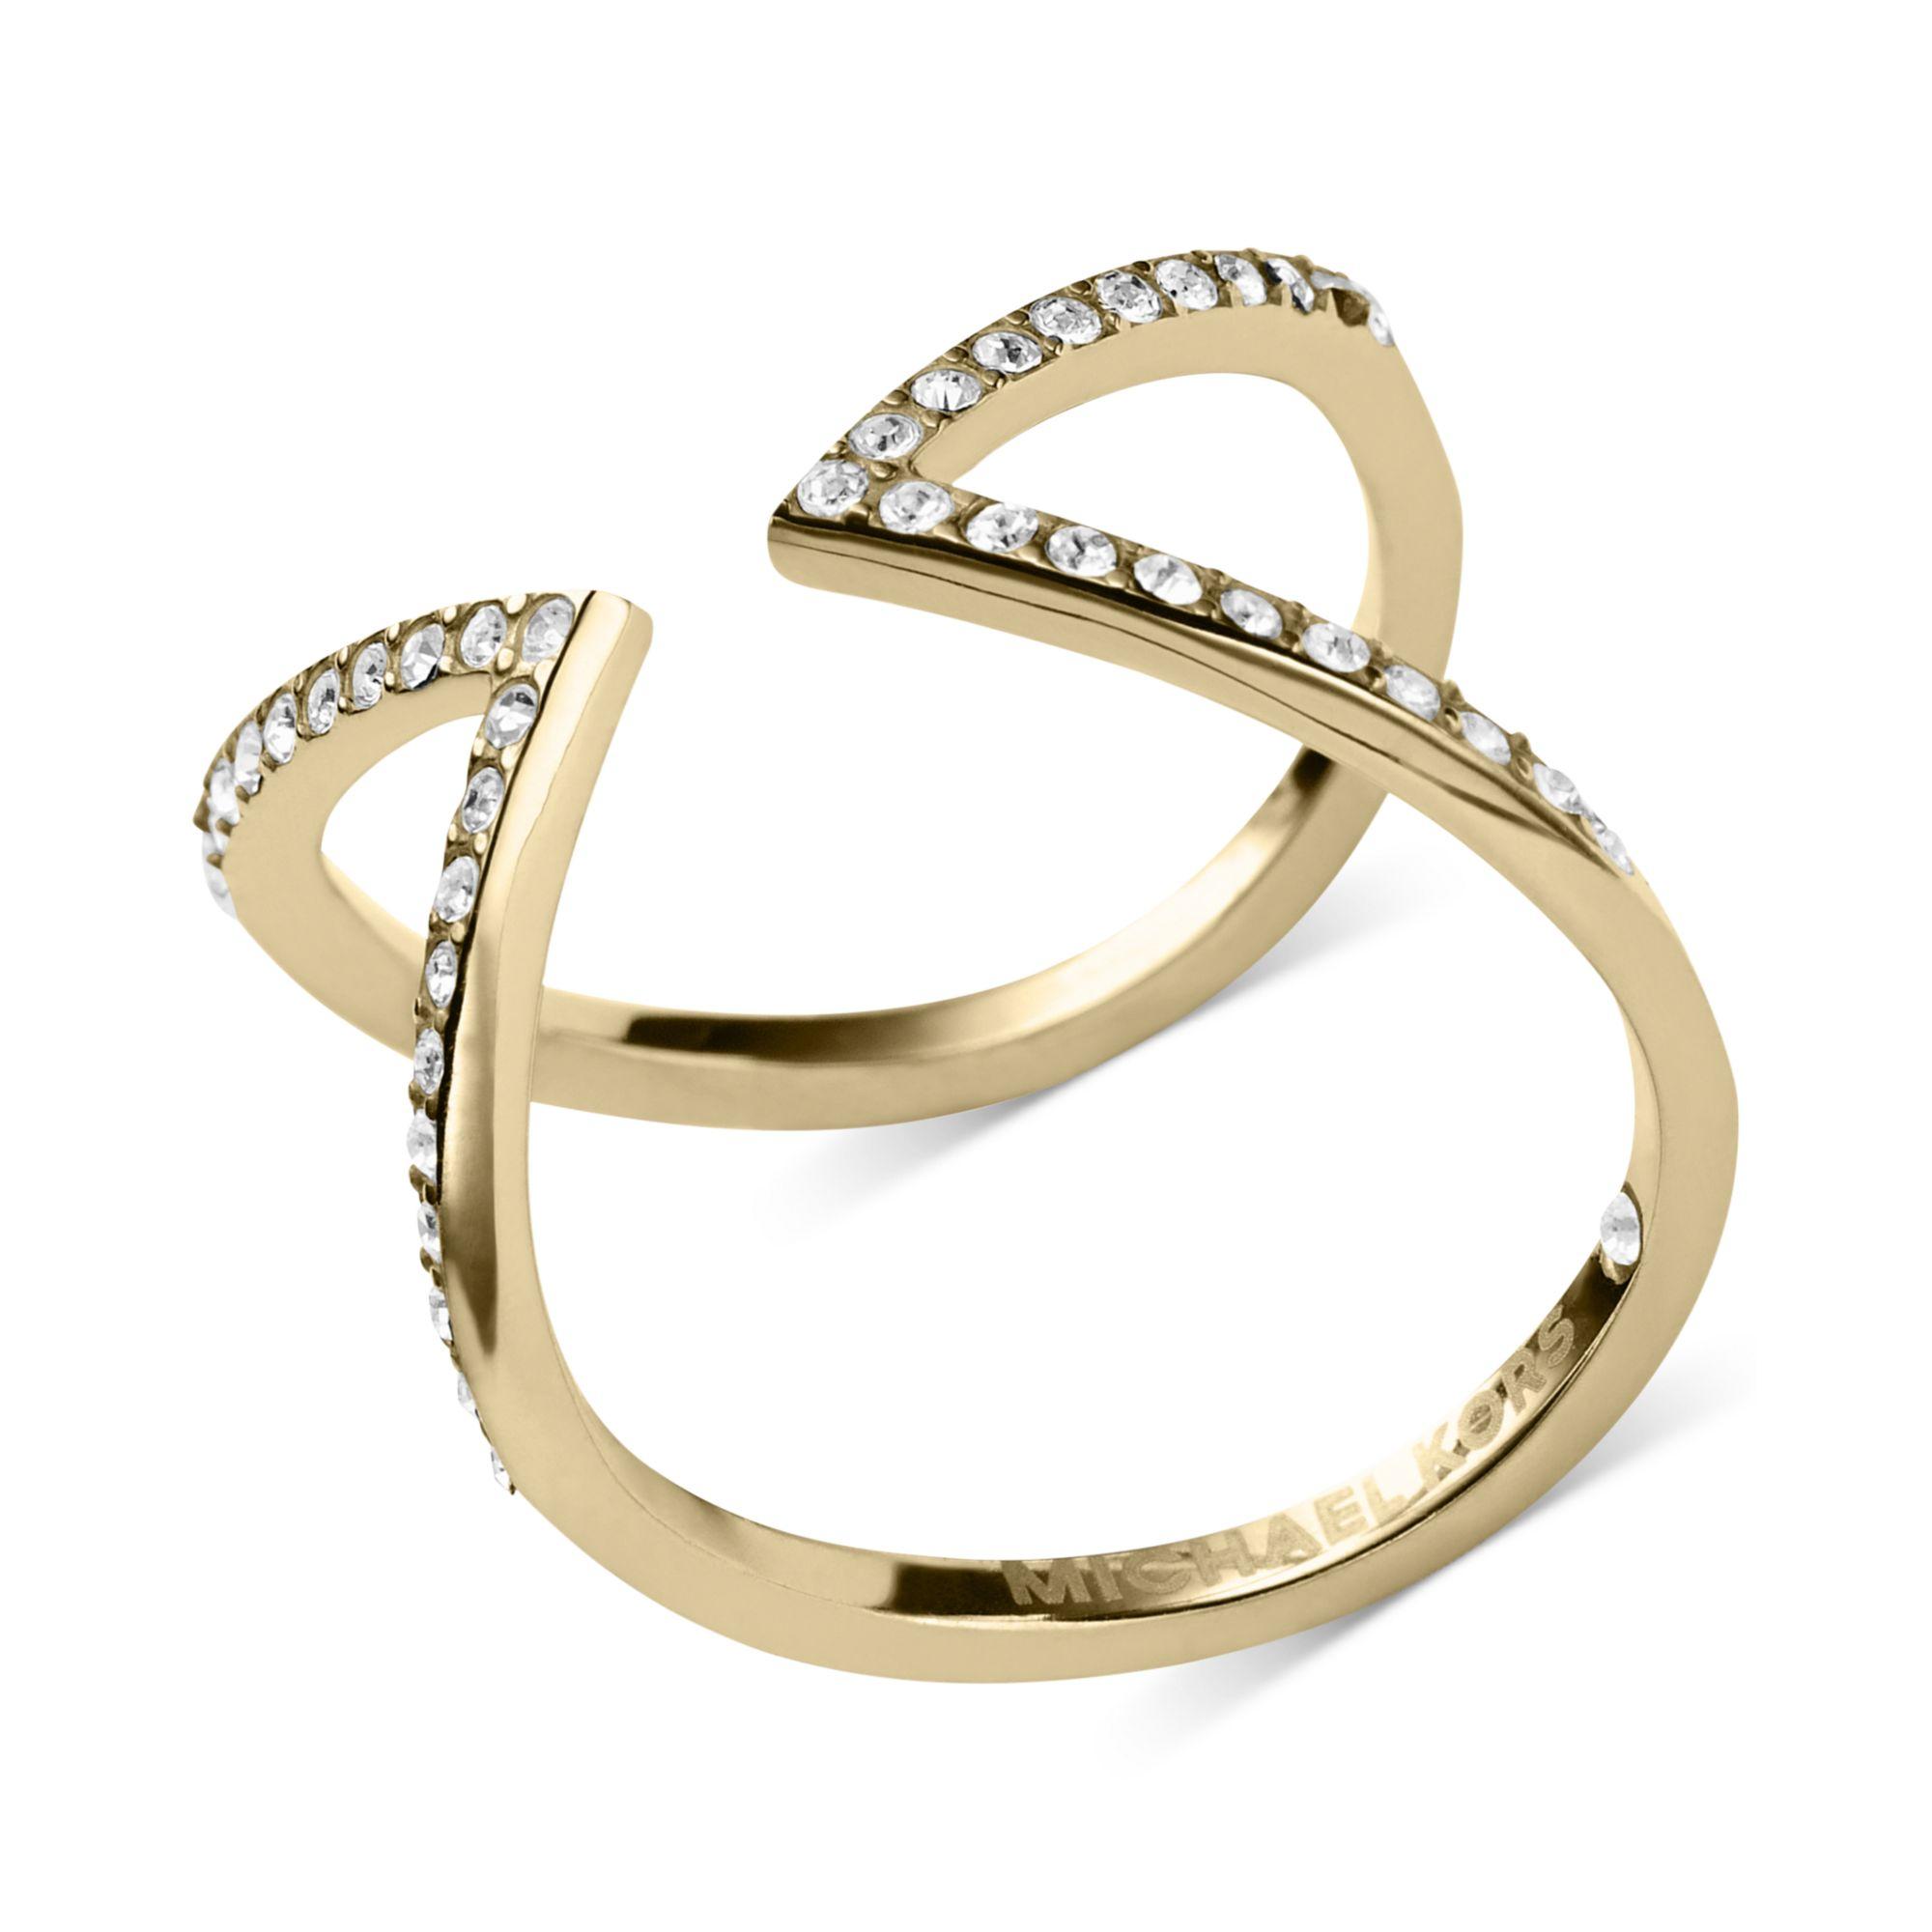 Michael Kors Open Arrow Clear Pav Ring in Gold